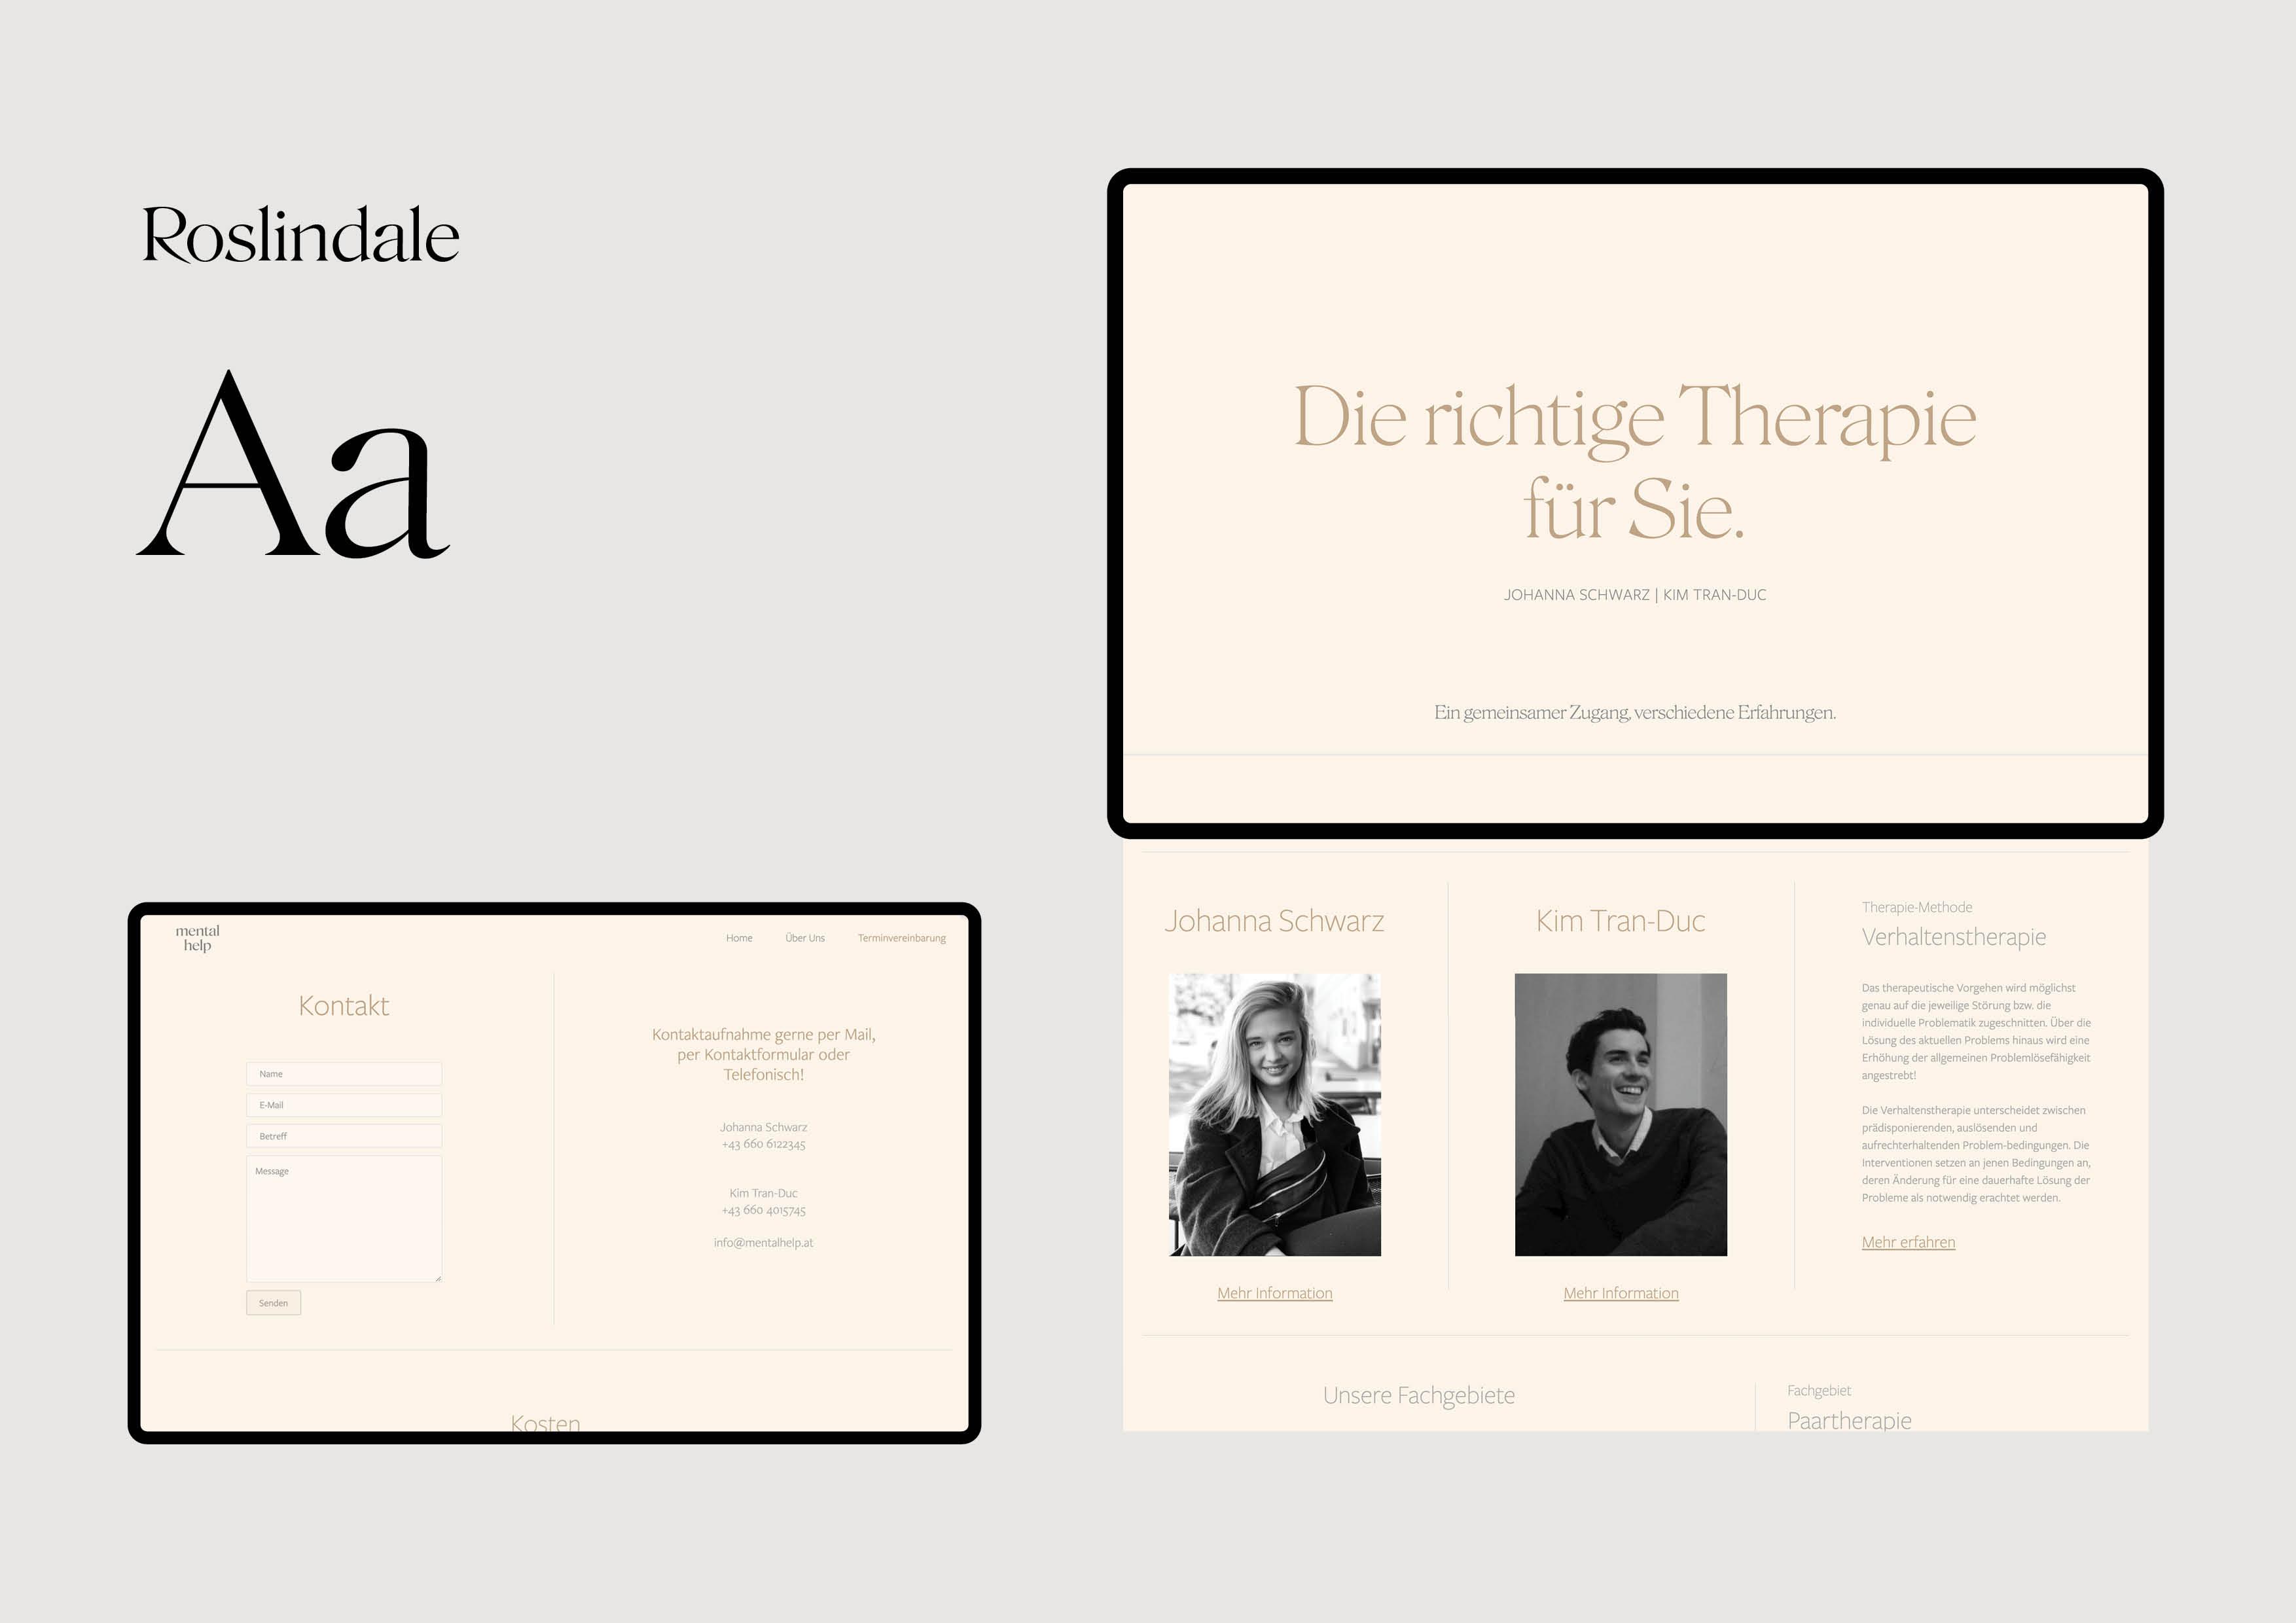 MentalHelp.at Website Design by Magdalena Weiss